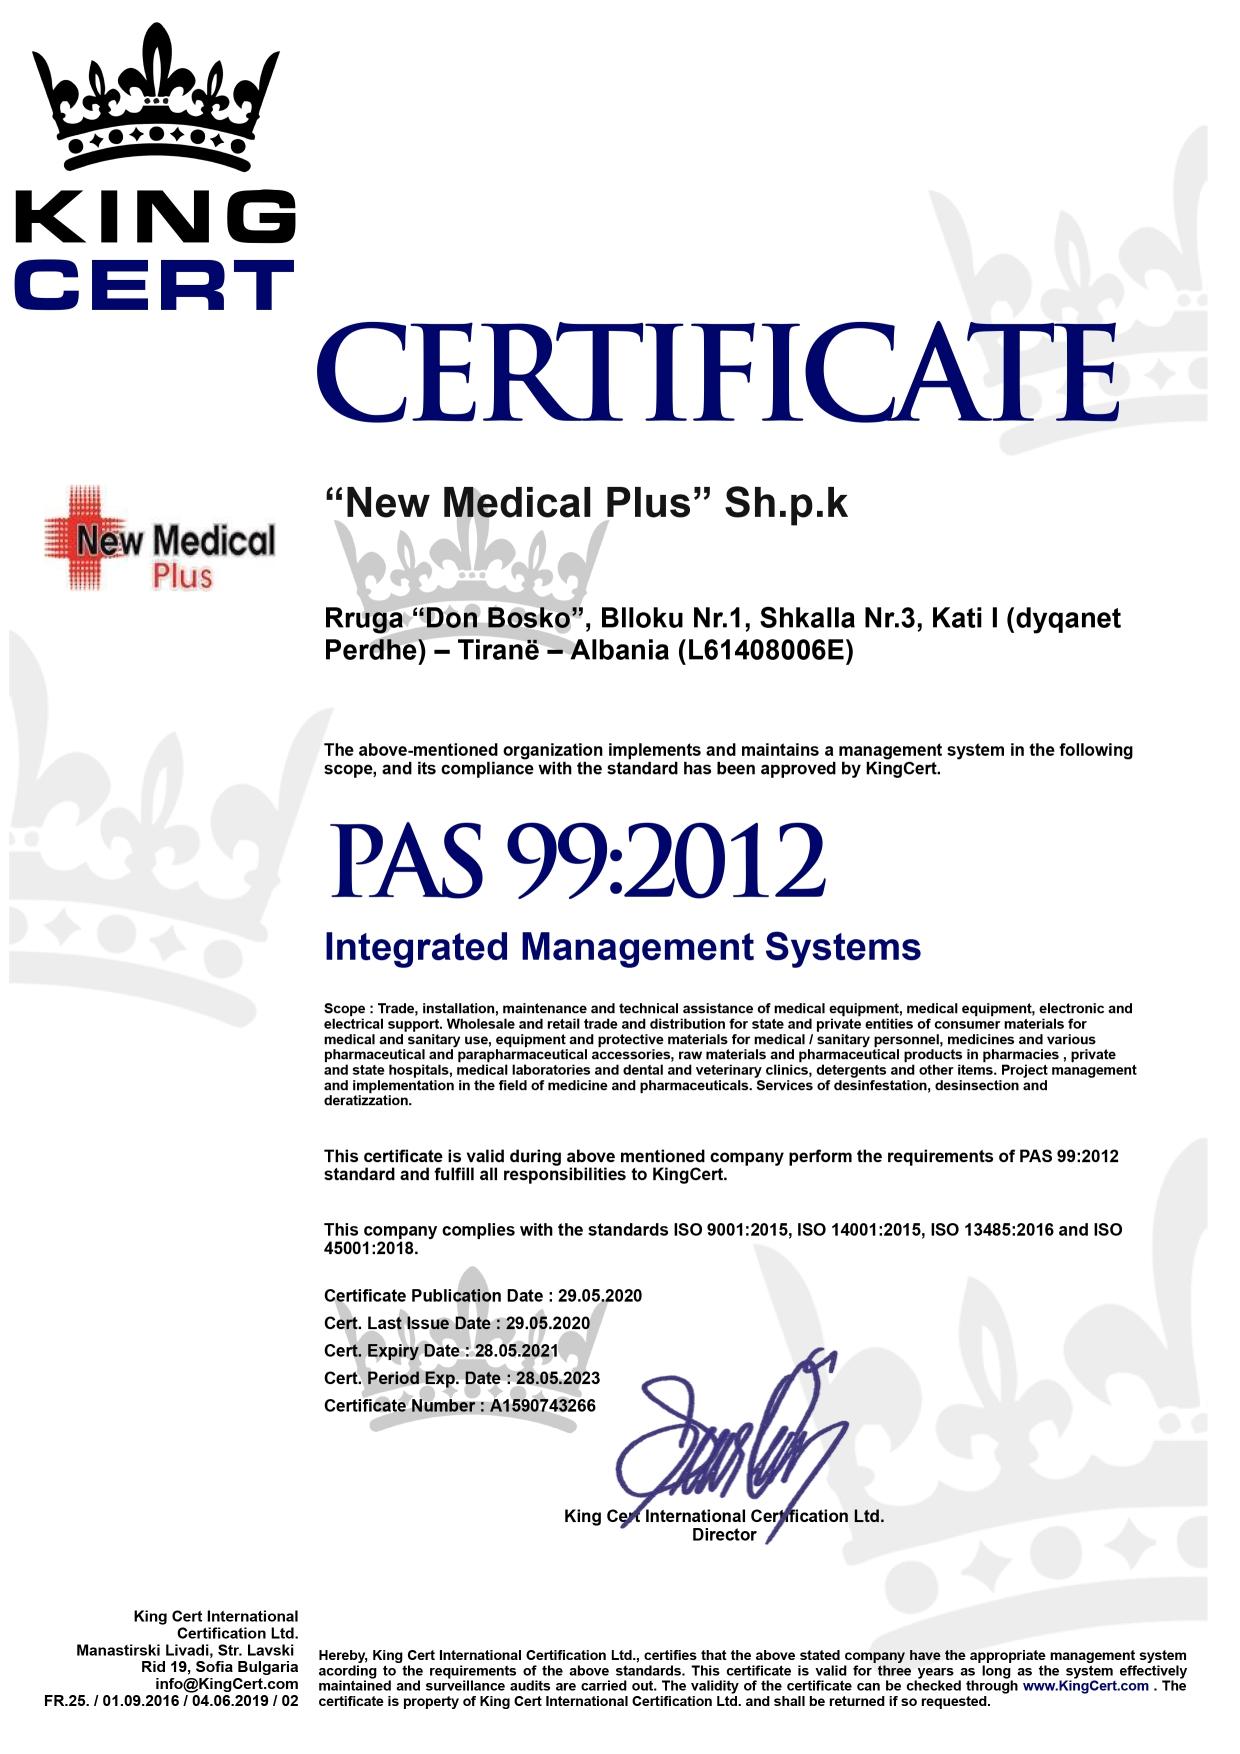 NEW MEDICAL PLUS WEBSITE CERTIFIKATA 3